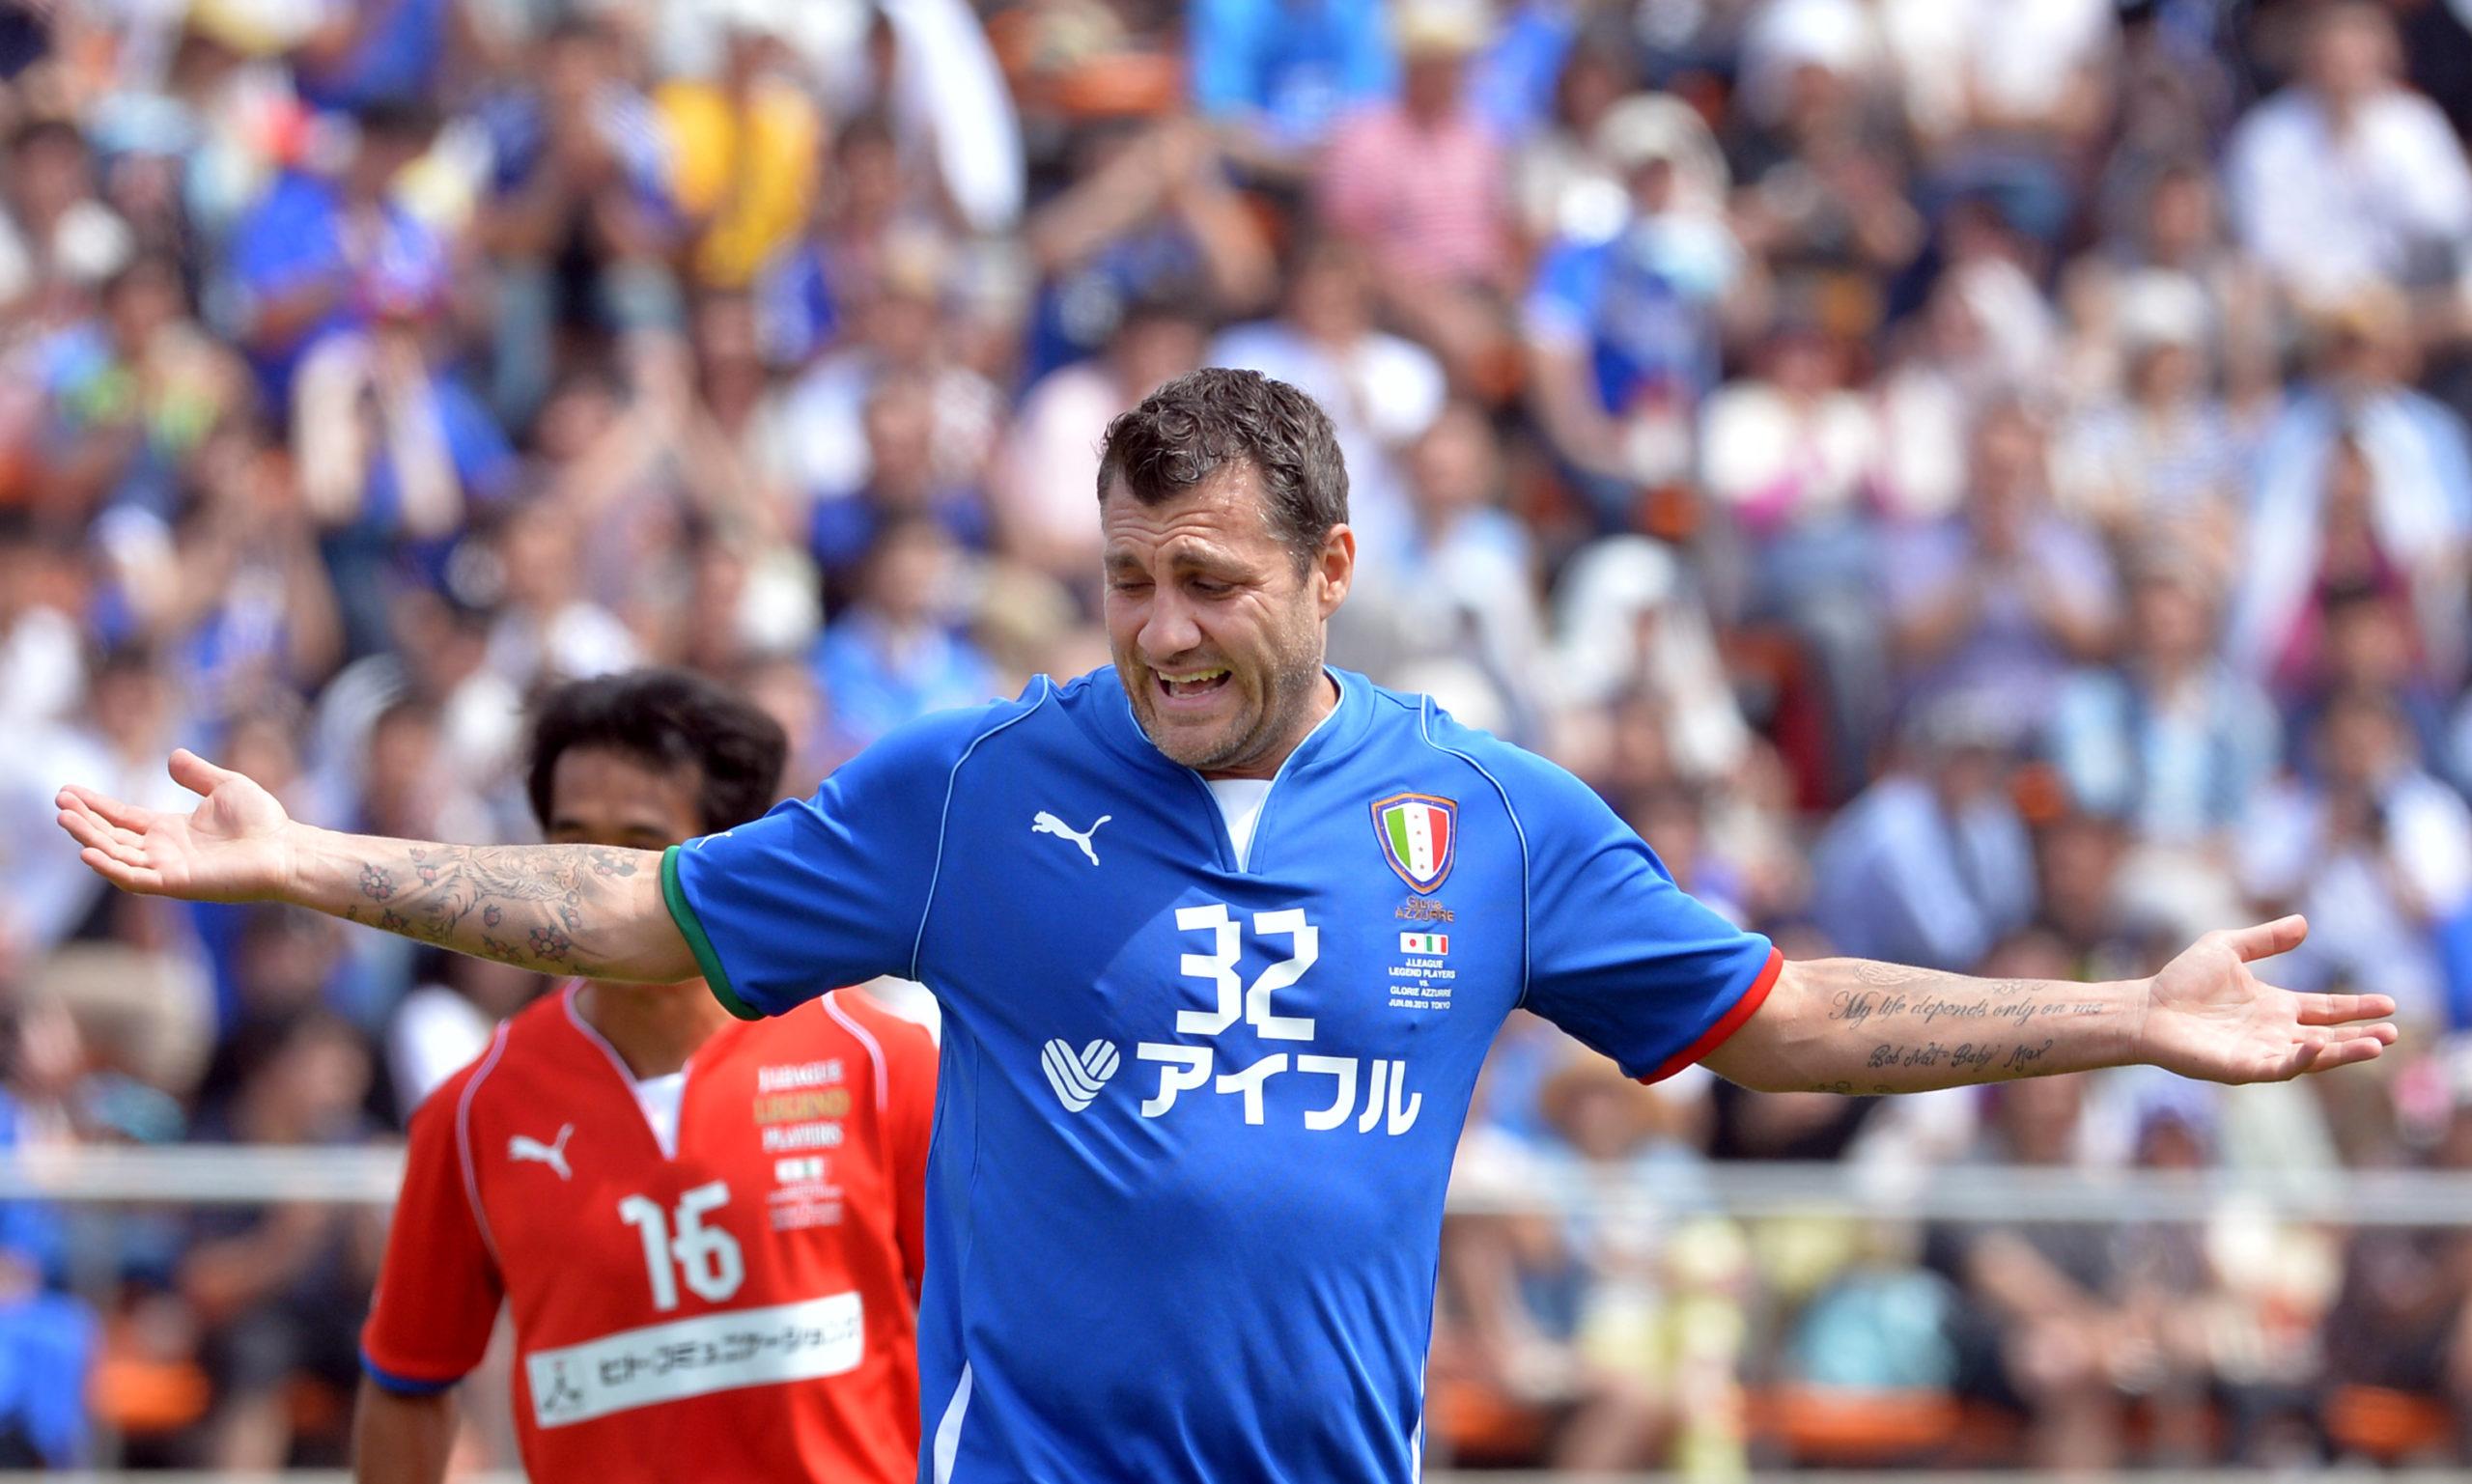 Vieri believes Inter have become Scudetto favorites following Ronaldo's departure